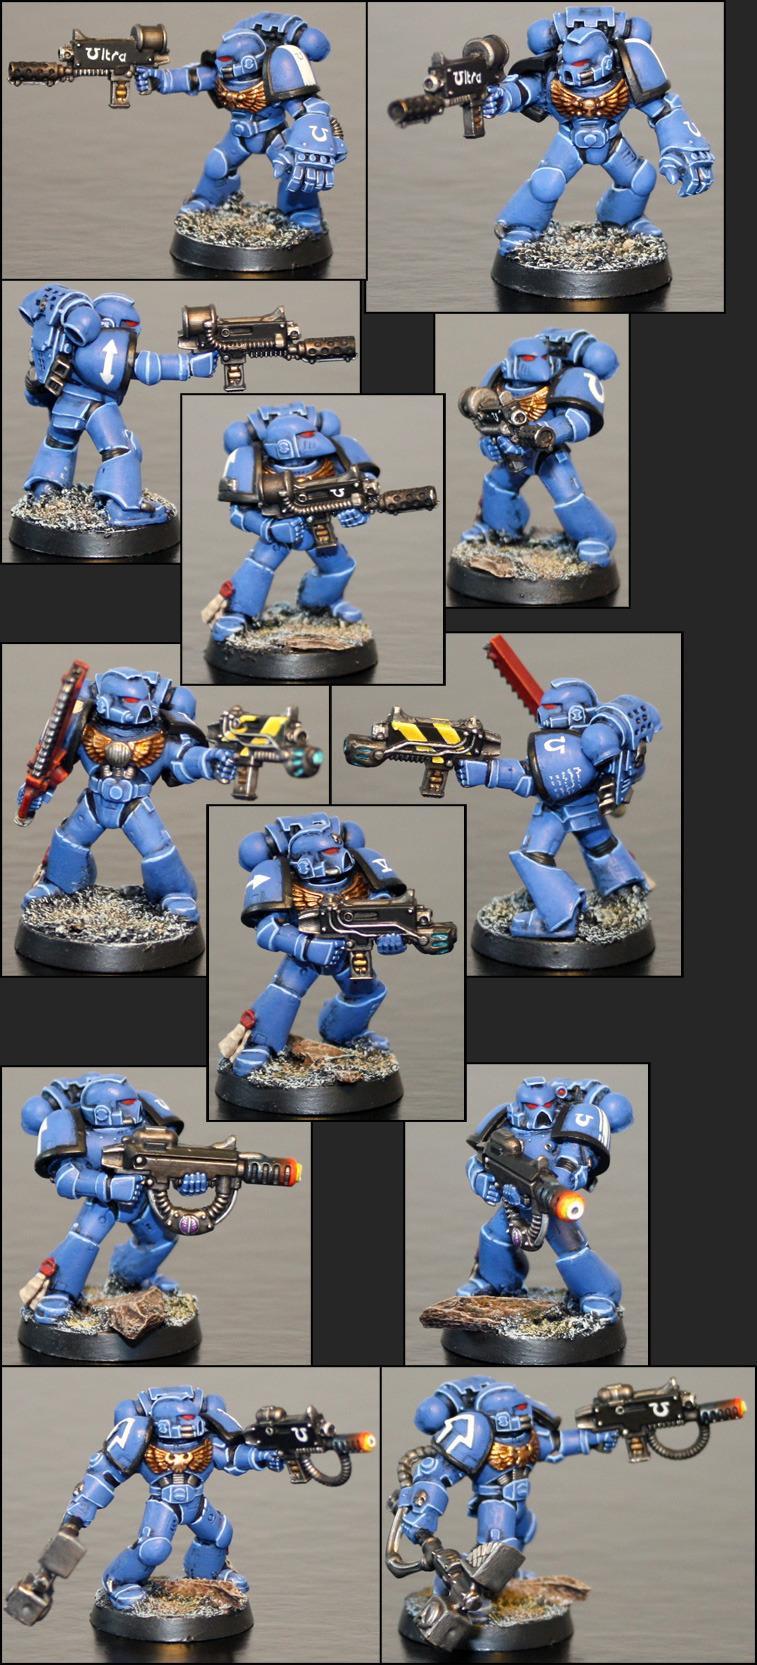 40 000, Flamer, Meltagun, Plasma, Space Marines, Special Weapons, Ultramarines, W40k, Warforge